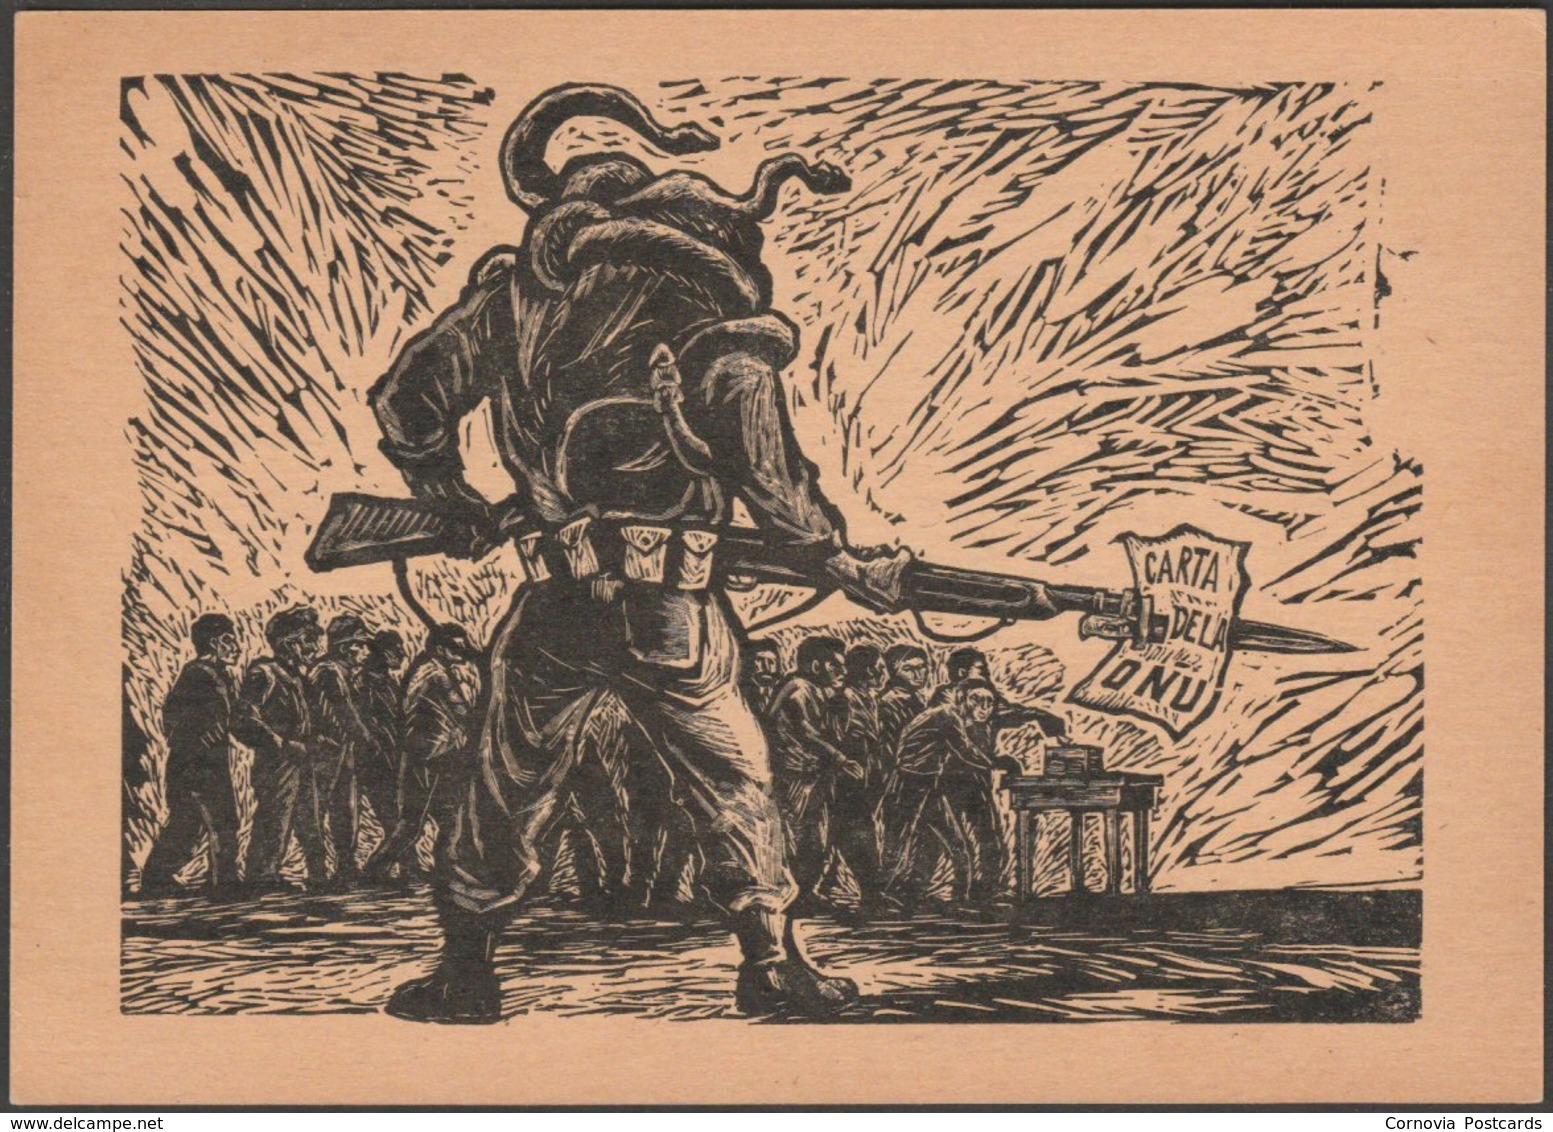 Arturo García Bustos - La Carta De La Onu, 1949 - Taller De Gráfica Popular Tarjeta Postal - Other Illustrators